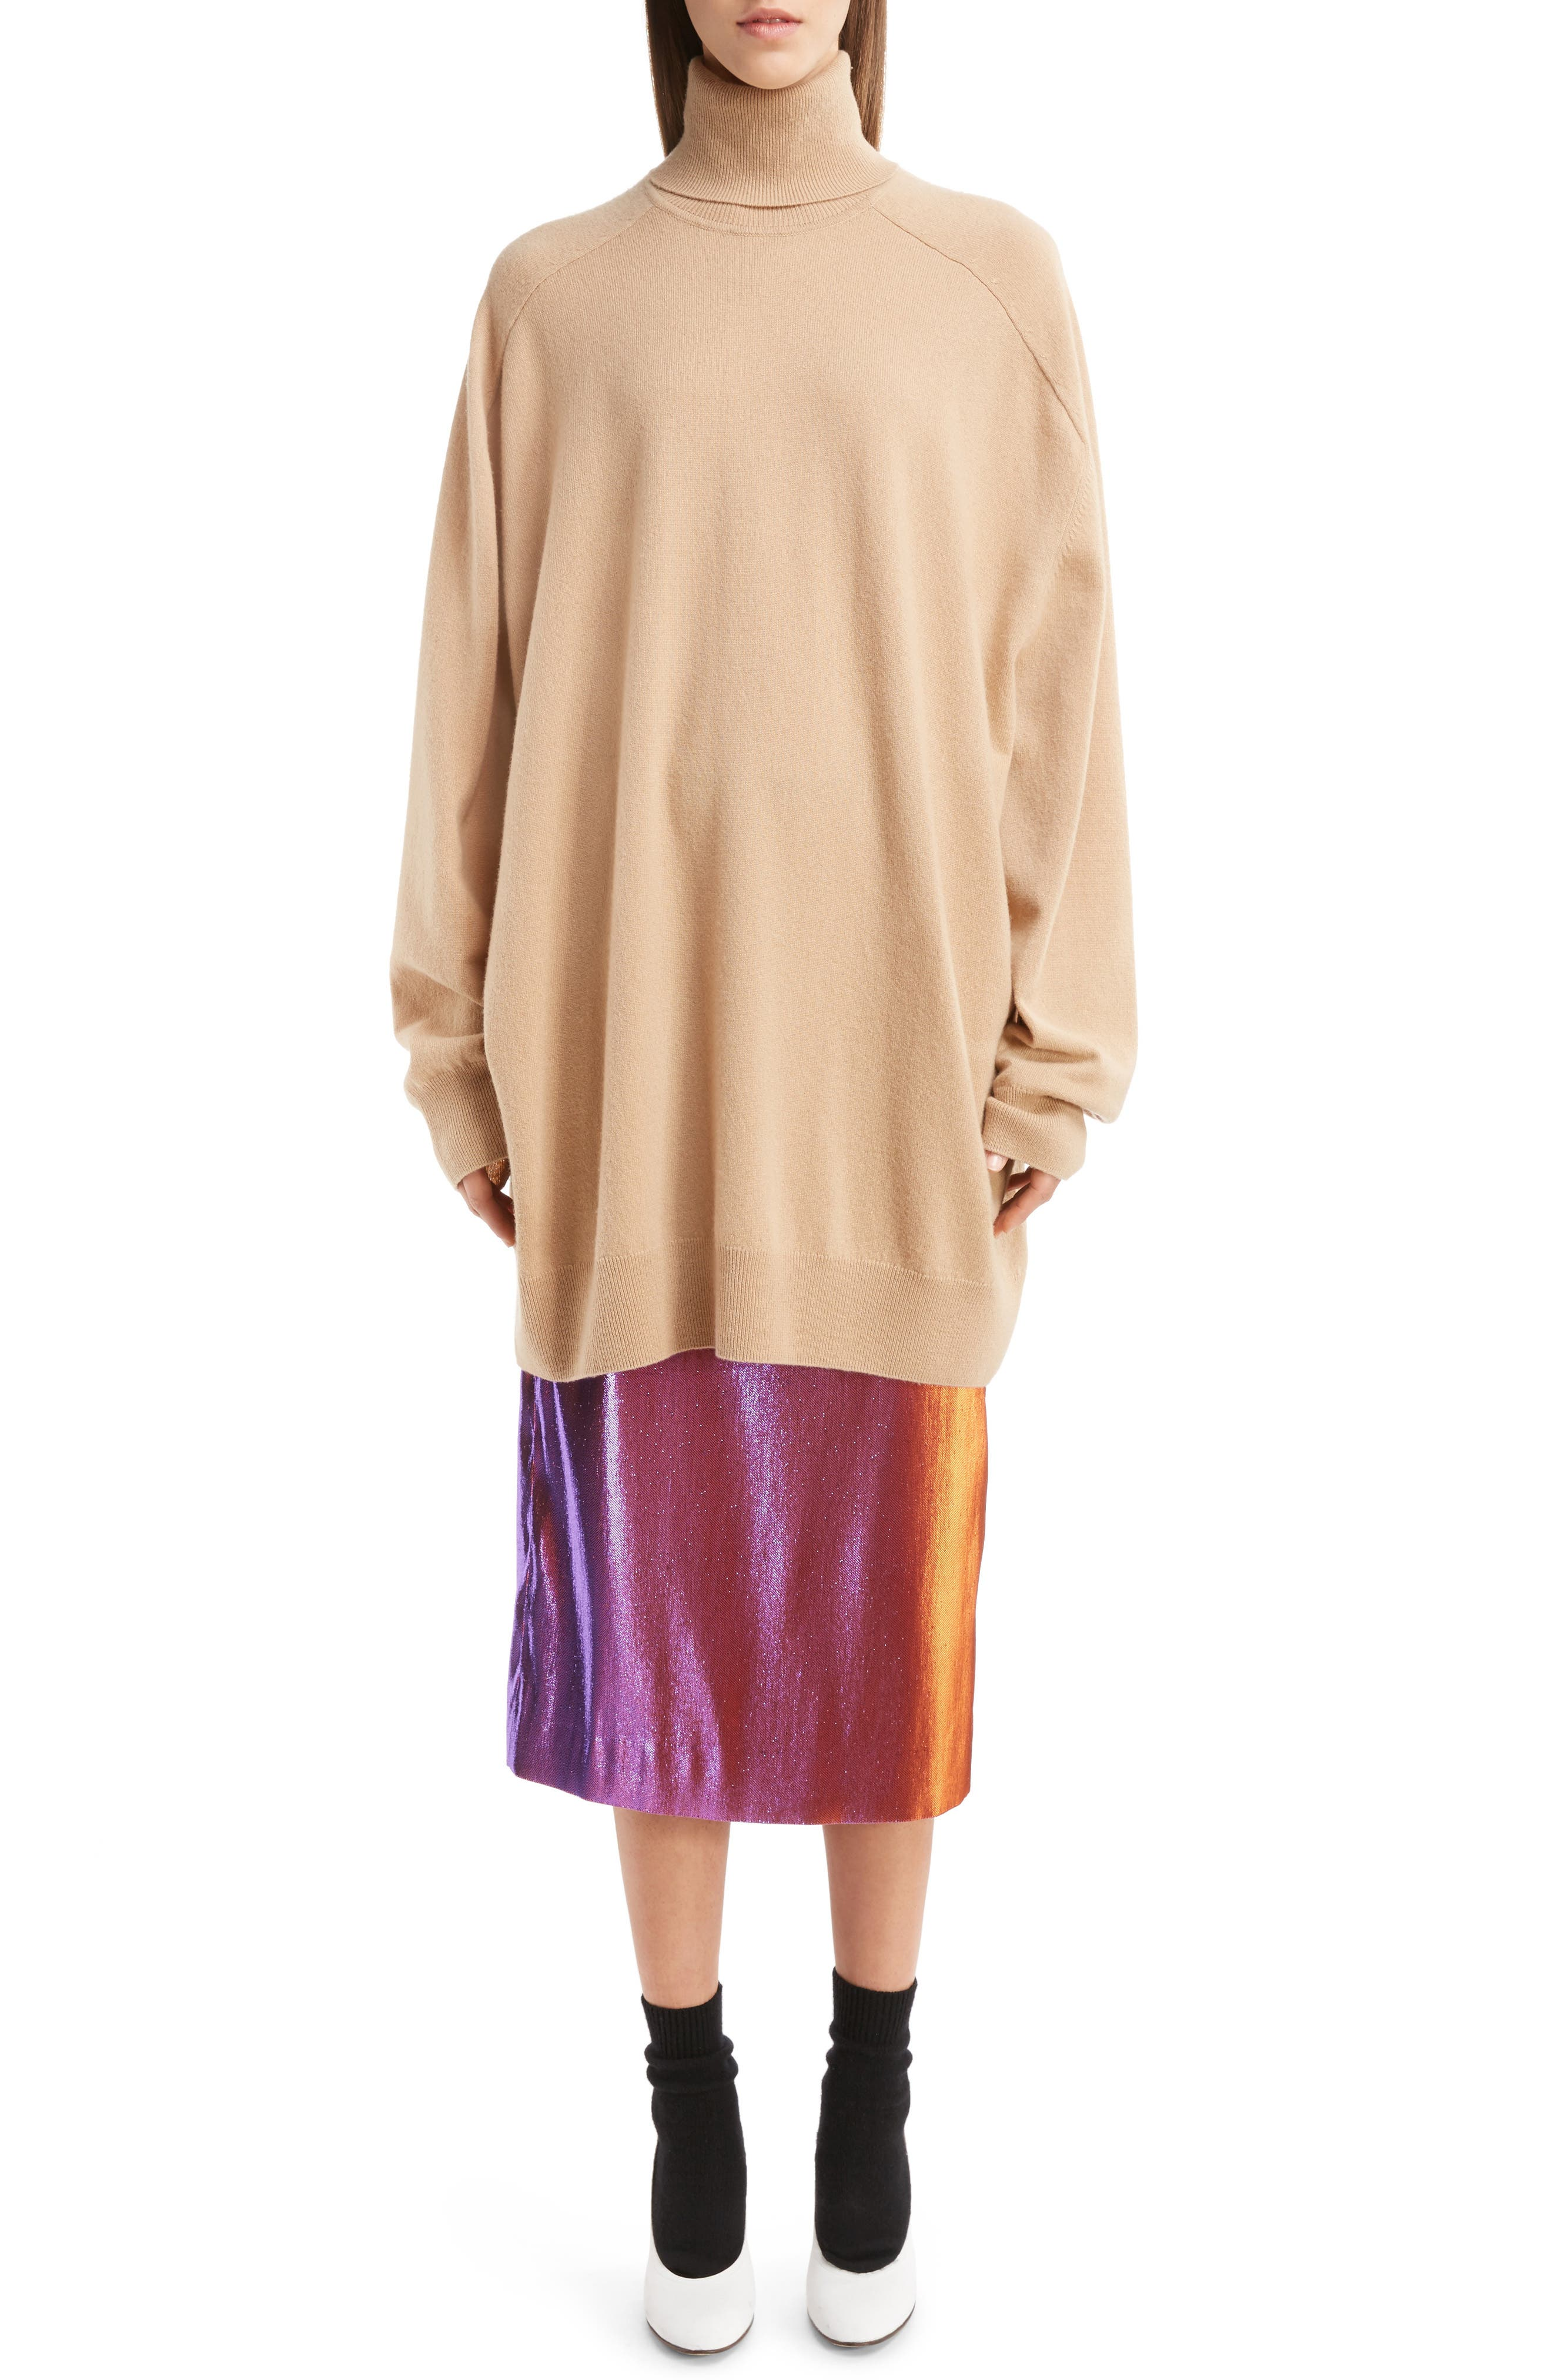 Oversized Cashmere Turtleneck Sweater,                             Alternate thumbnail 6, color,                             Camel